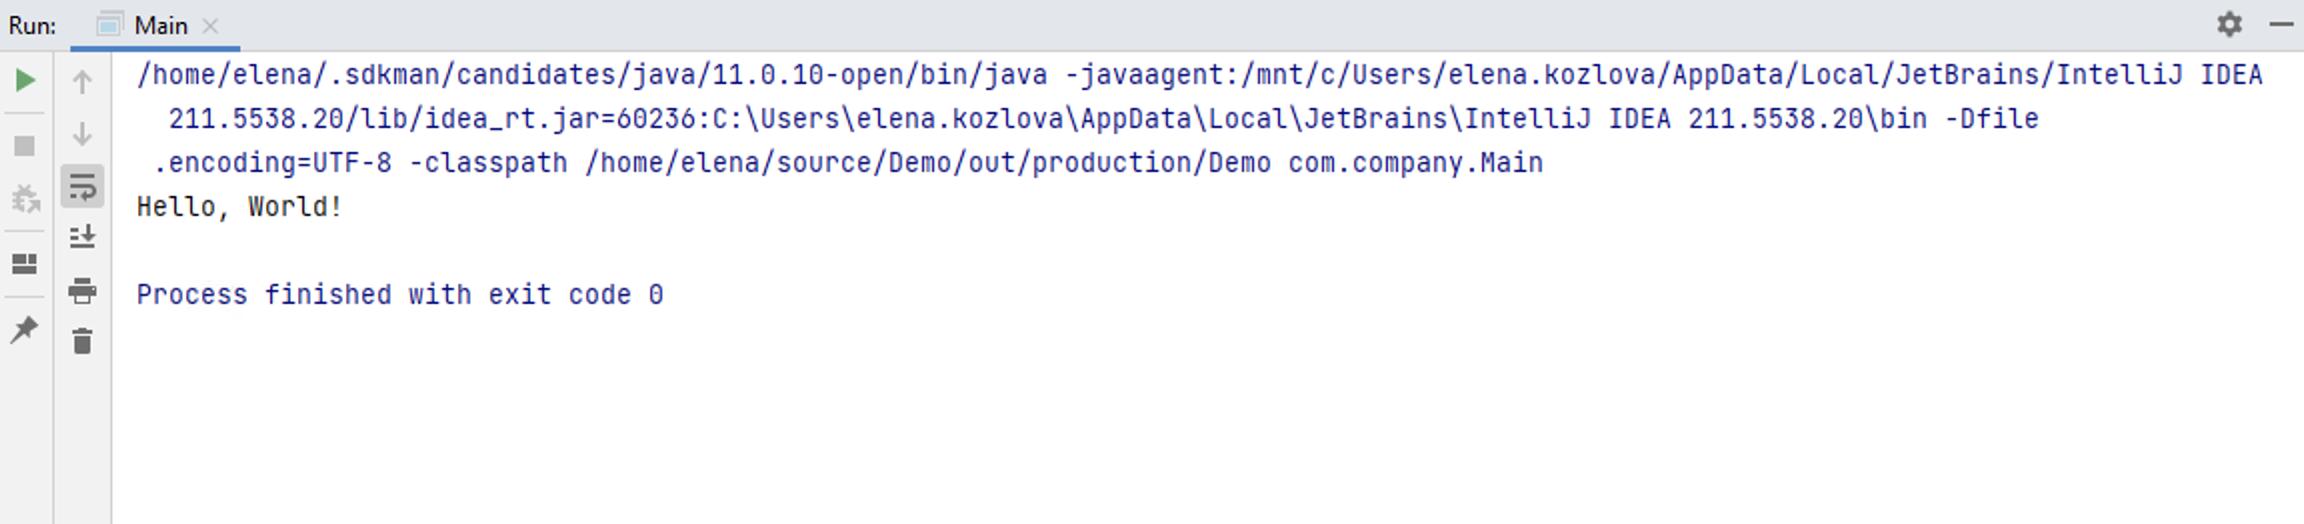 Run tool window: wsl results